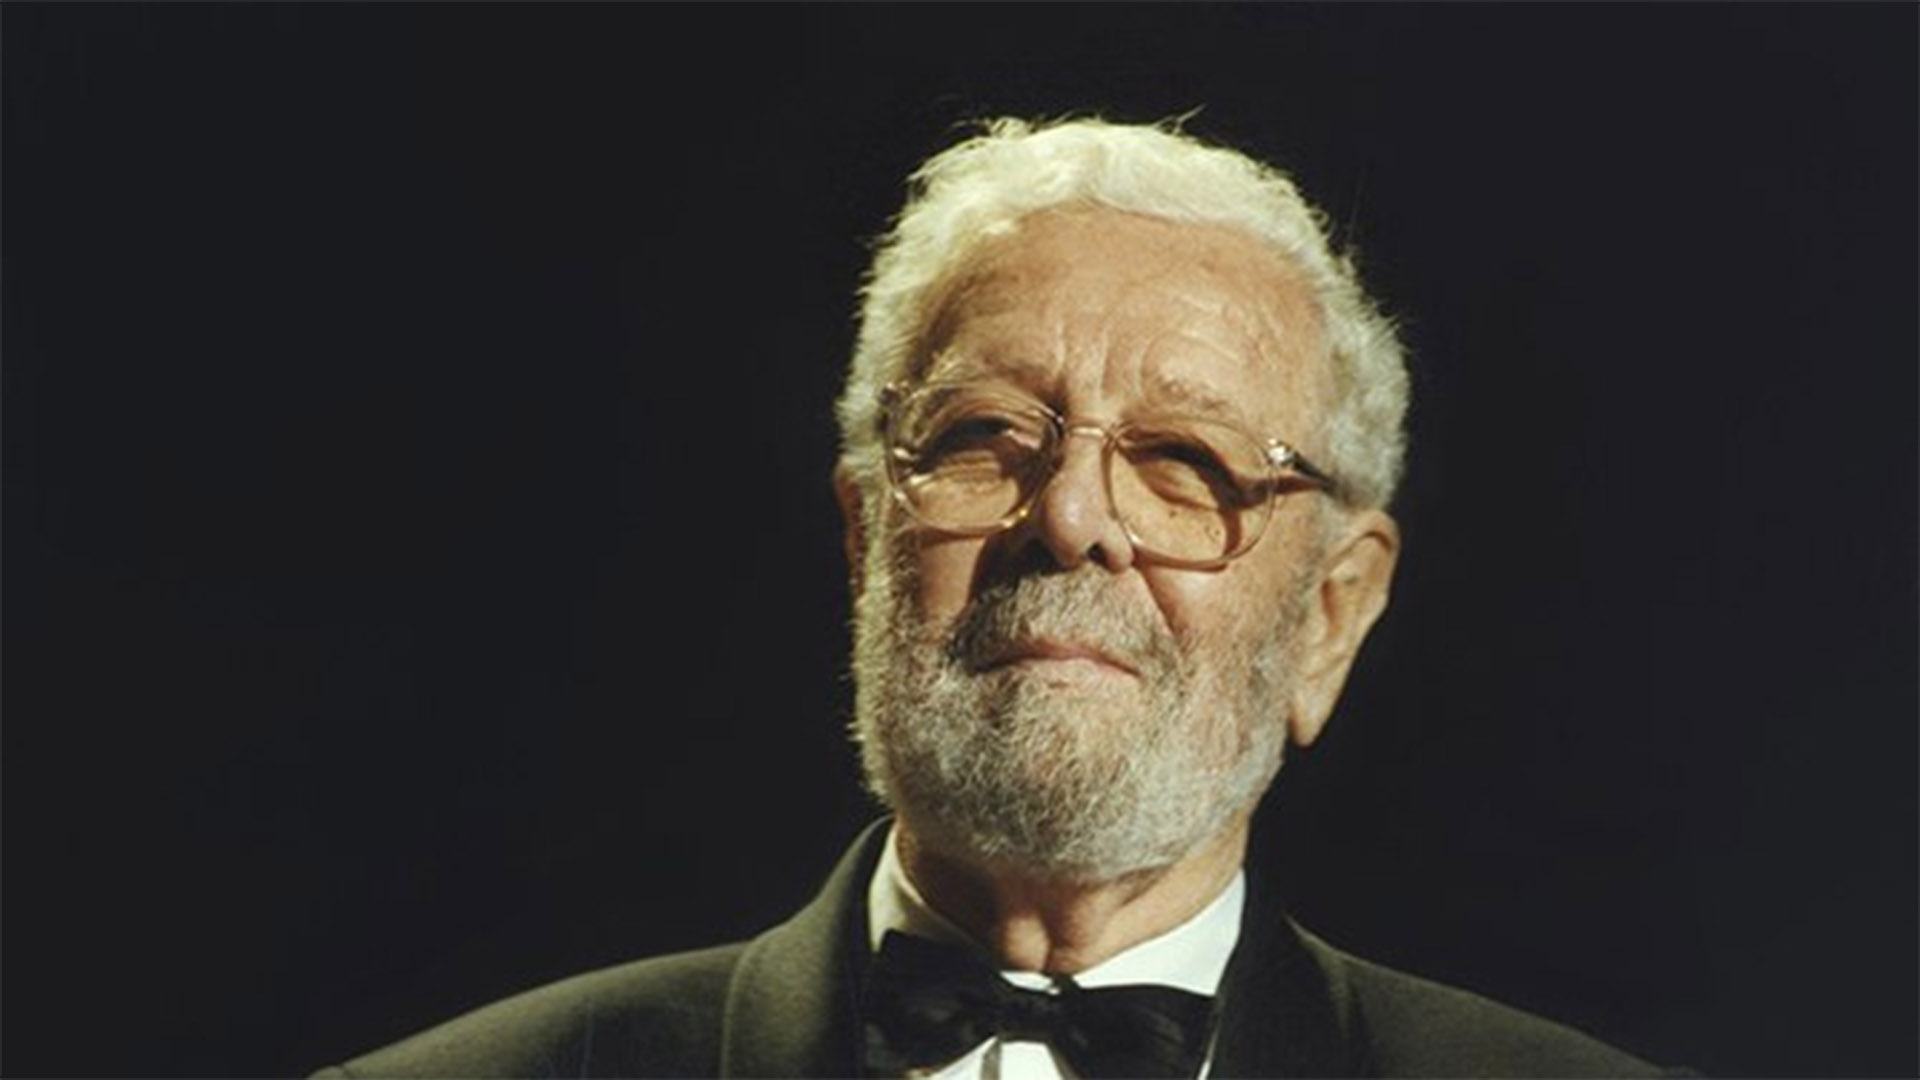 García Berlanga